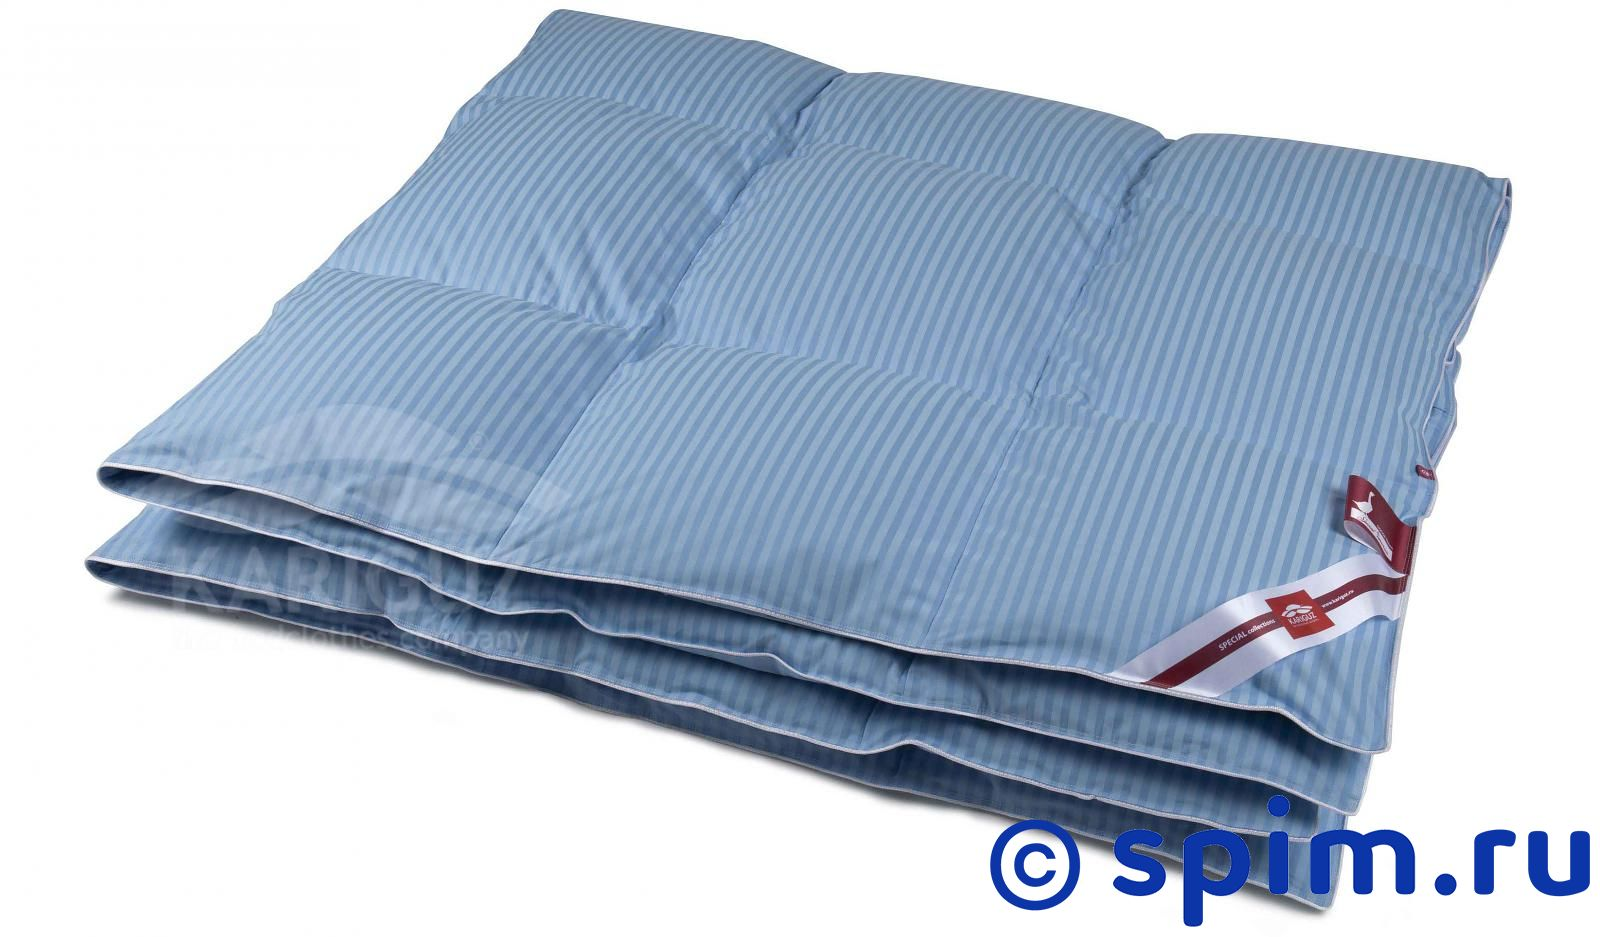 Купить Одеяло Kariguz Classic, зимнее 170(172)х205 см